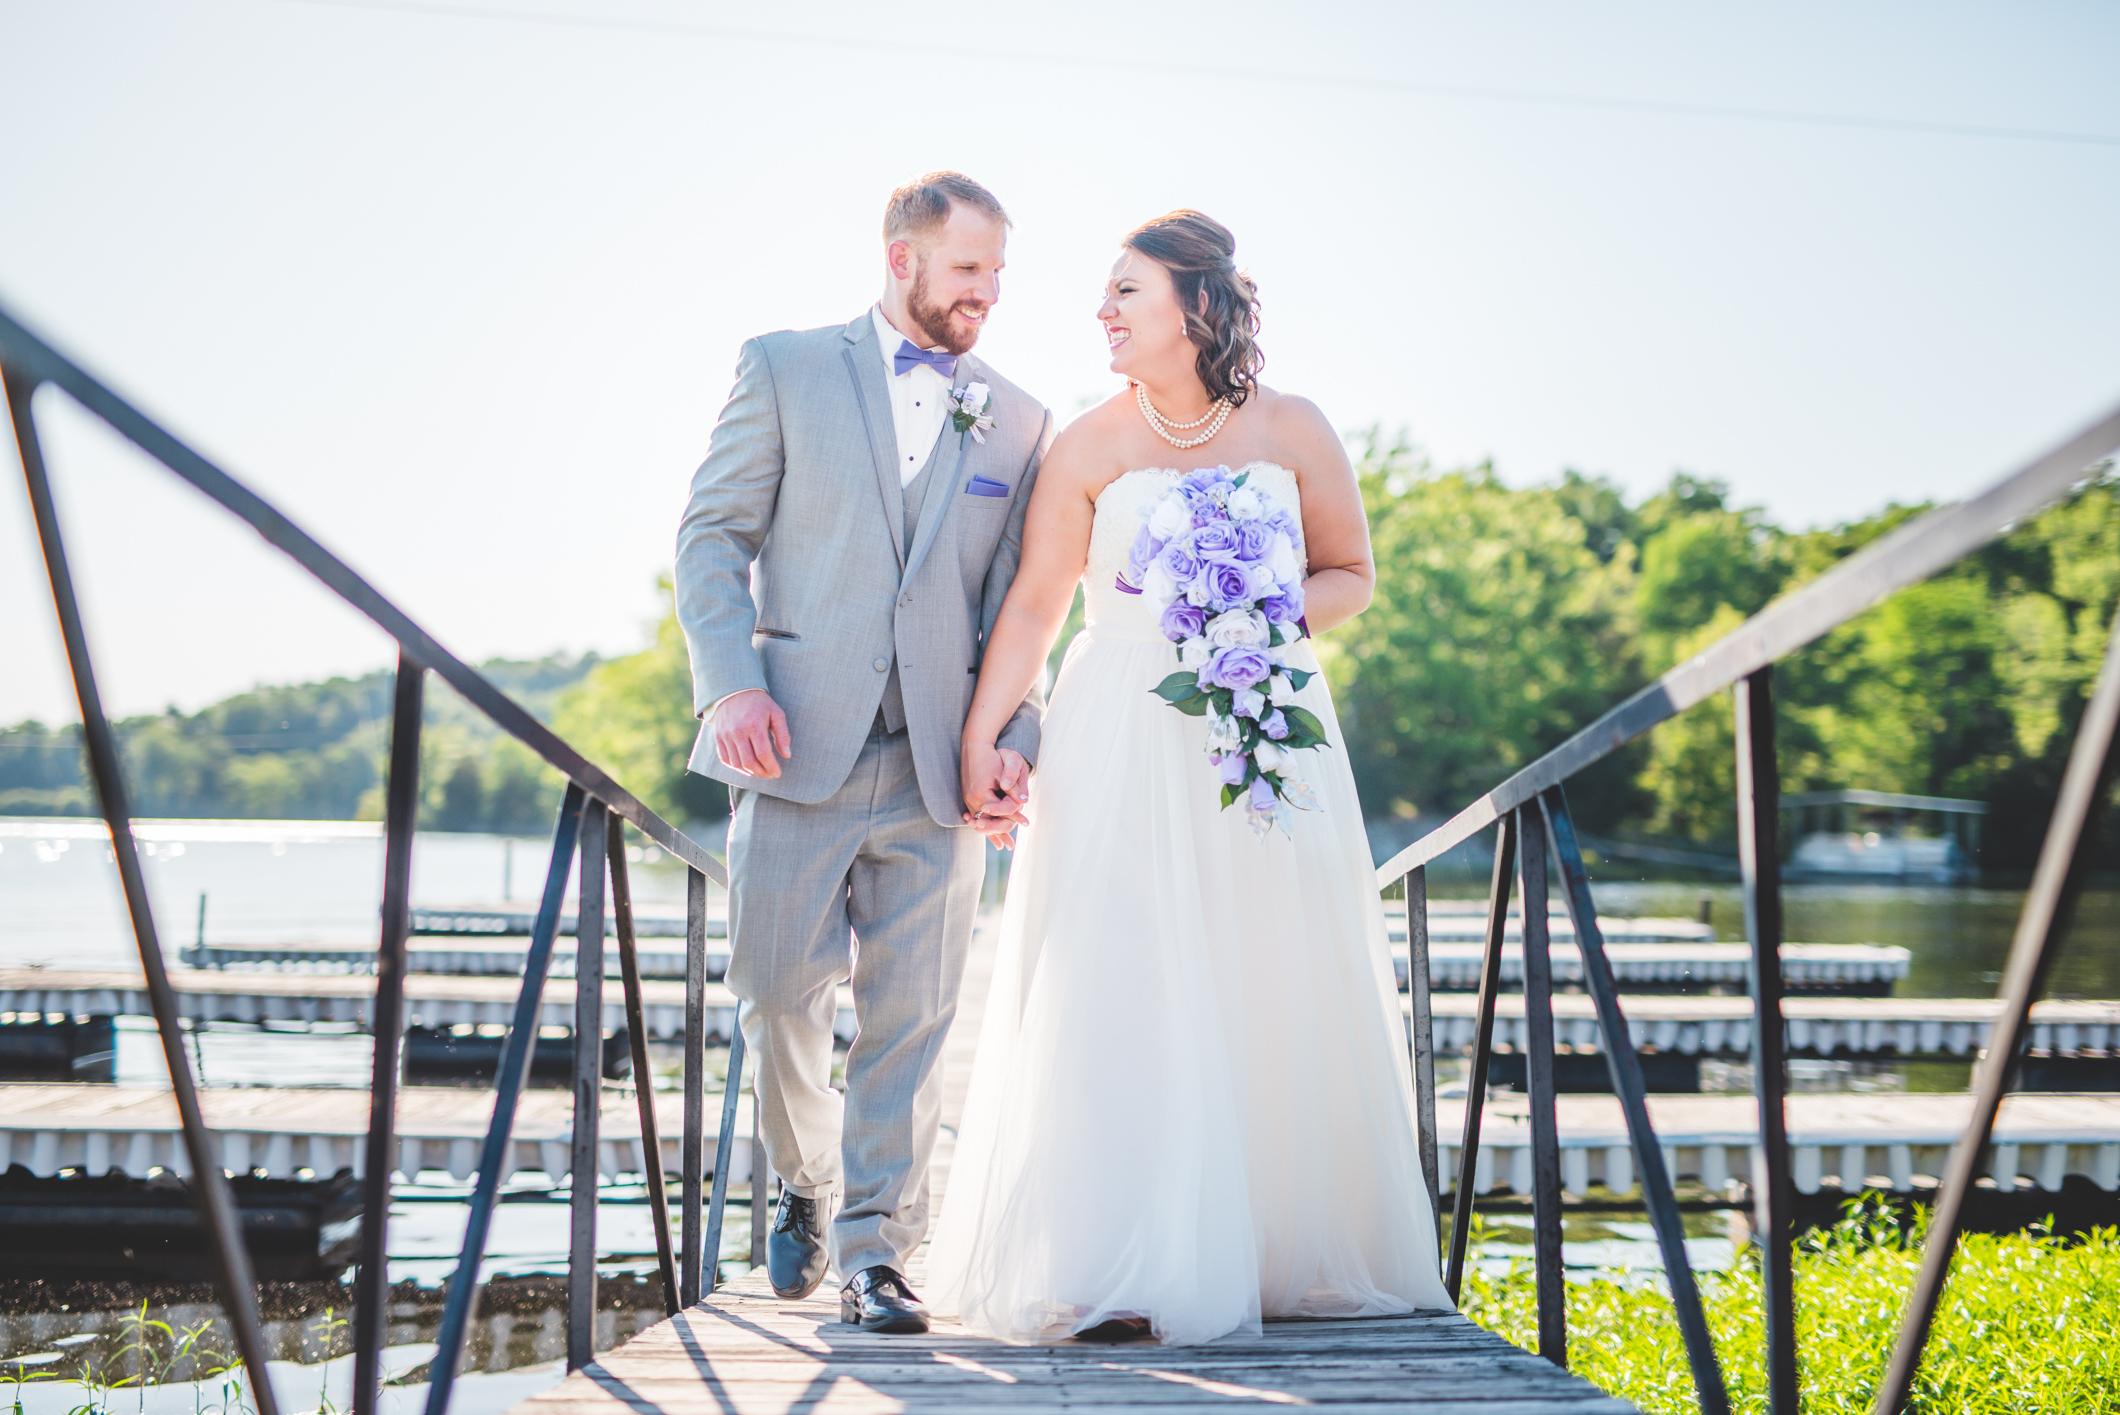 Casey & CJ Wedding - Preview - Creative Cure Weddings-14.jpg